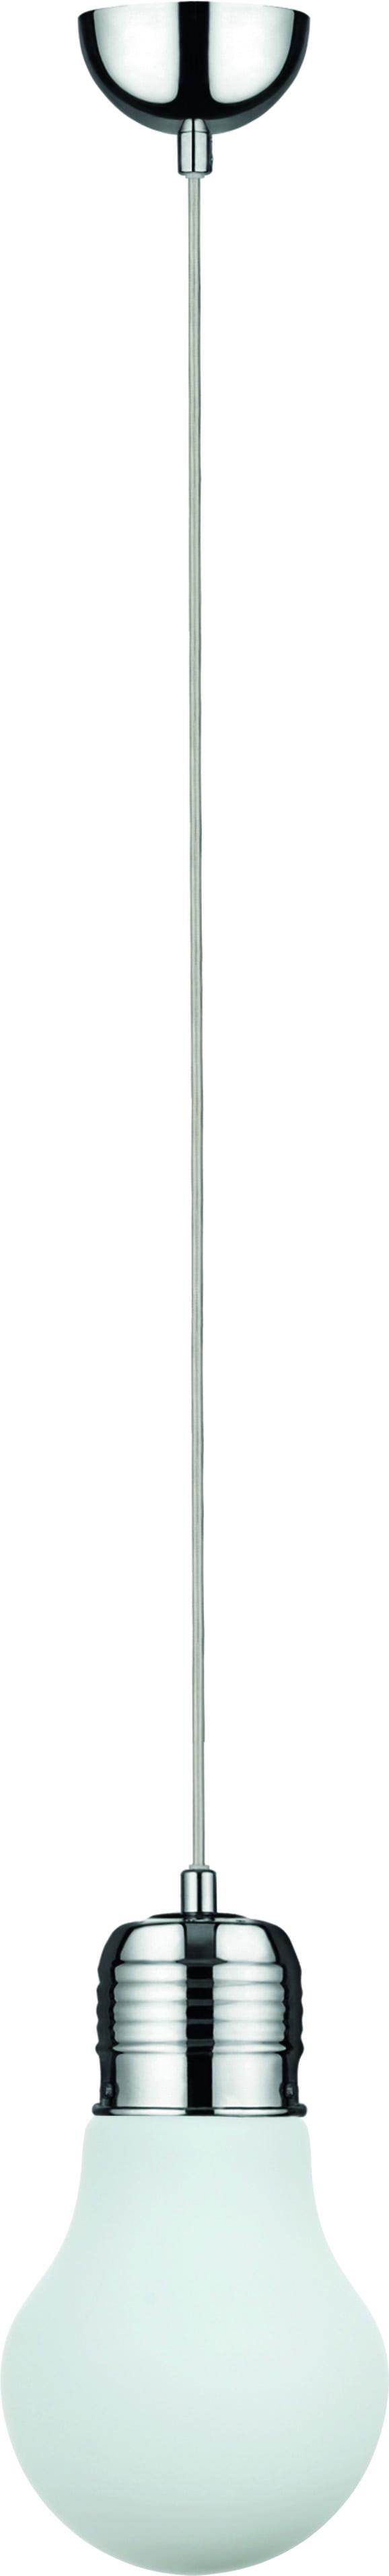 Pendant lamp Bulb chrome / white E27 60W